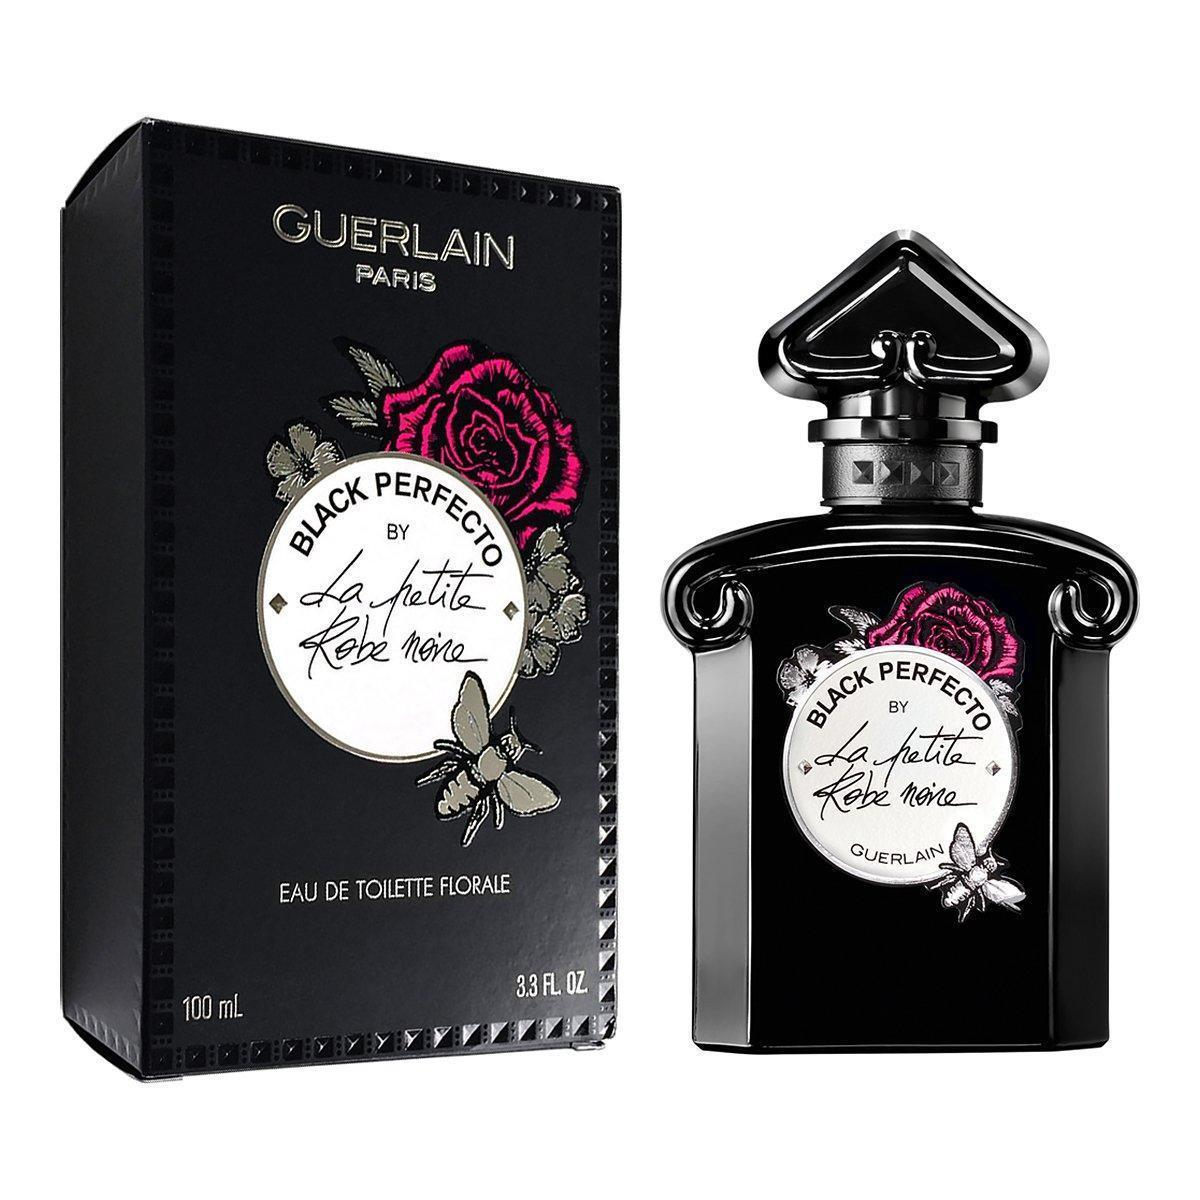 Жіноча туалетна вода Guerlain La Petite Robe Noire Black Perfecto Florale